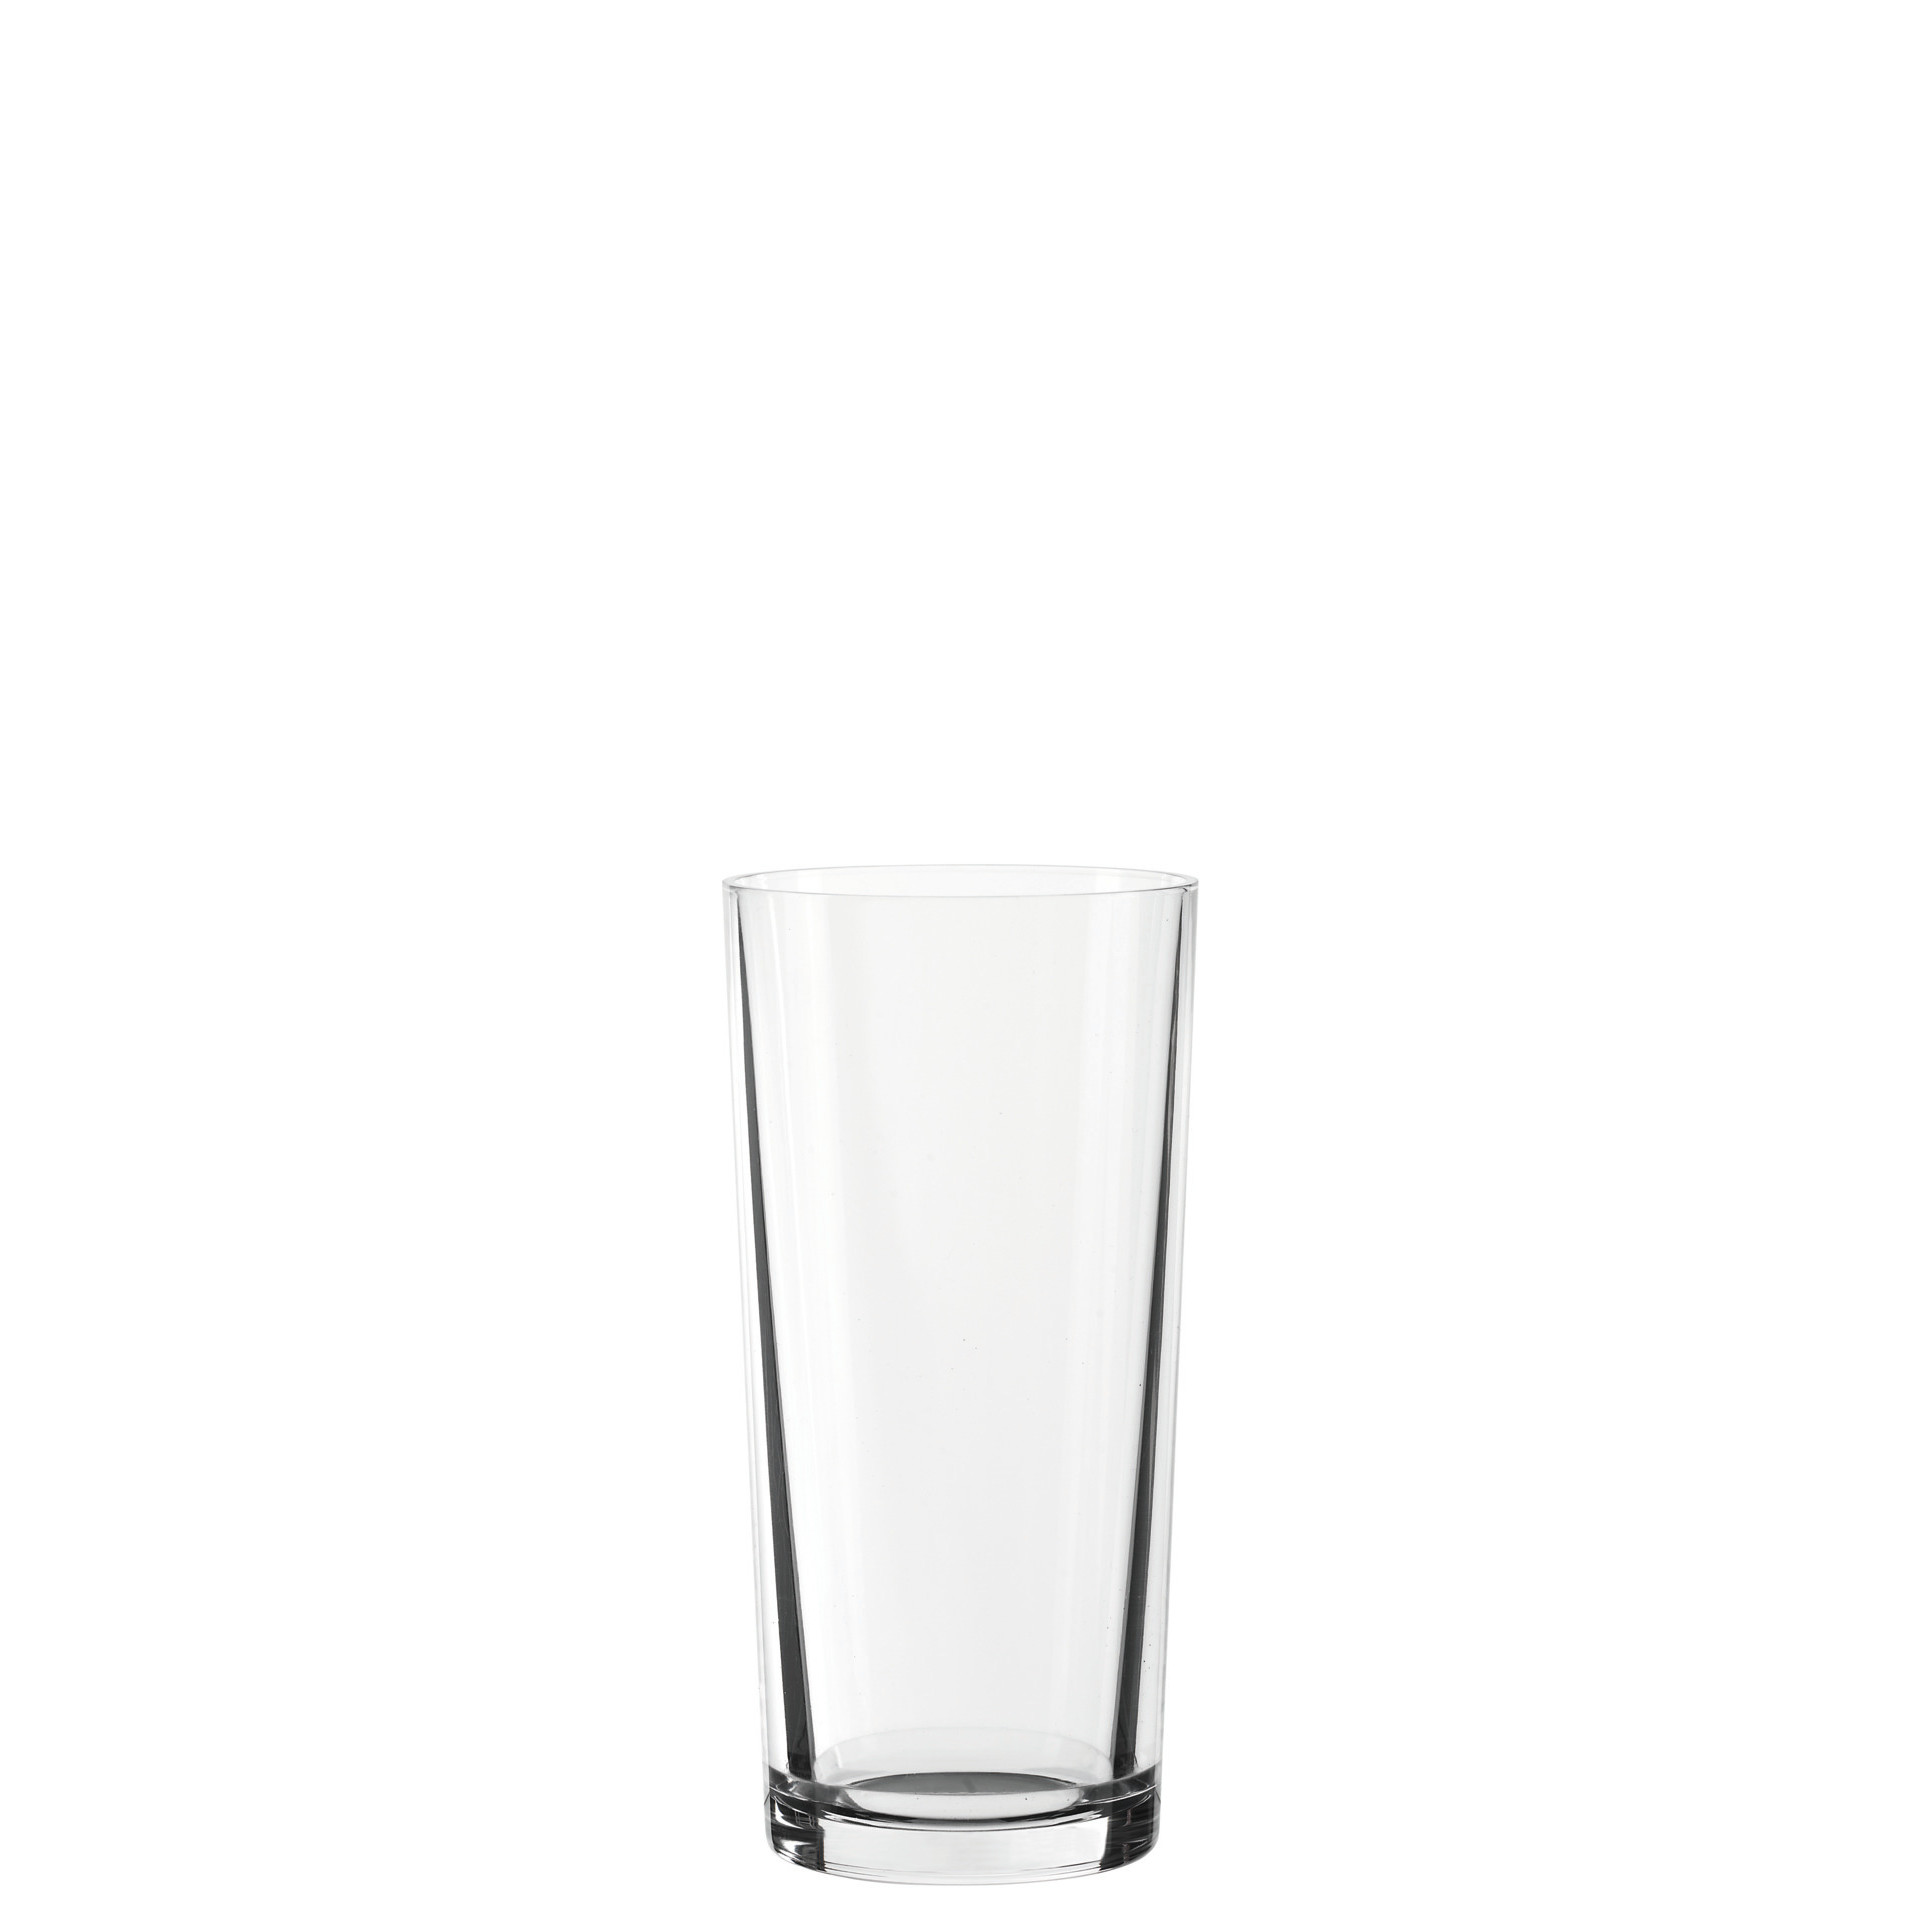 Club, Highballglas ø 72 mm / 0,35 l